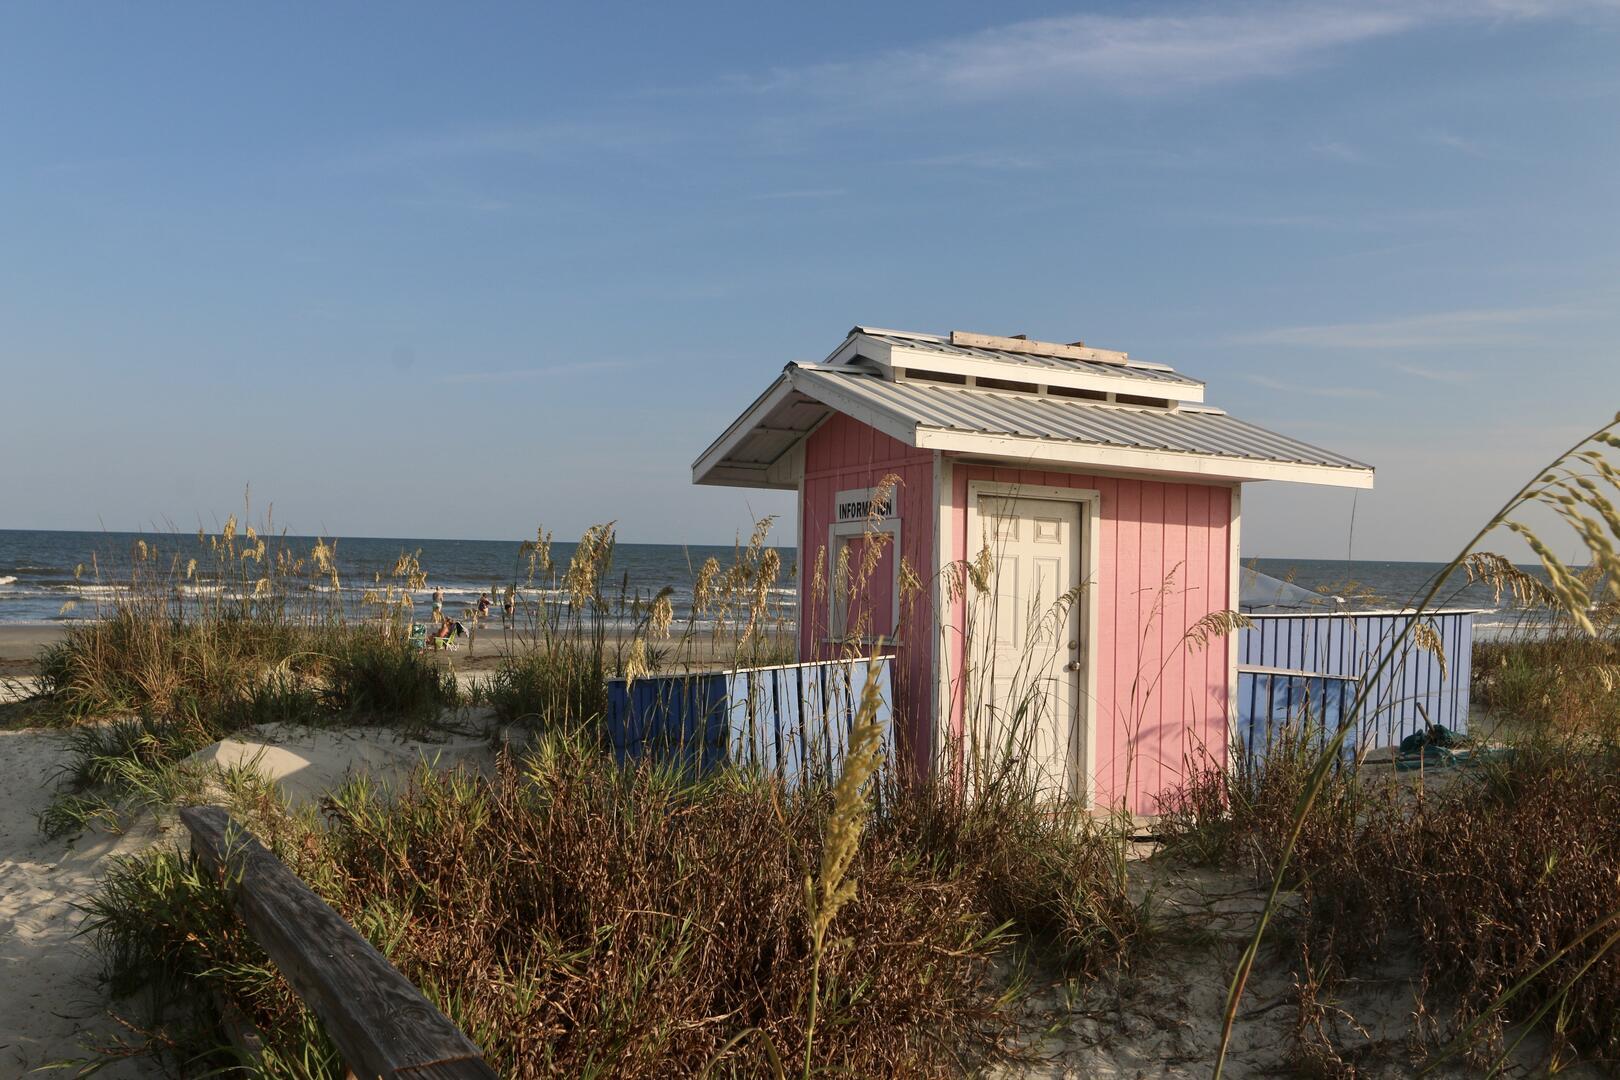 Beach Hut-Rent Chairs and Umbrellas